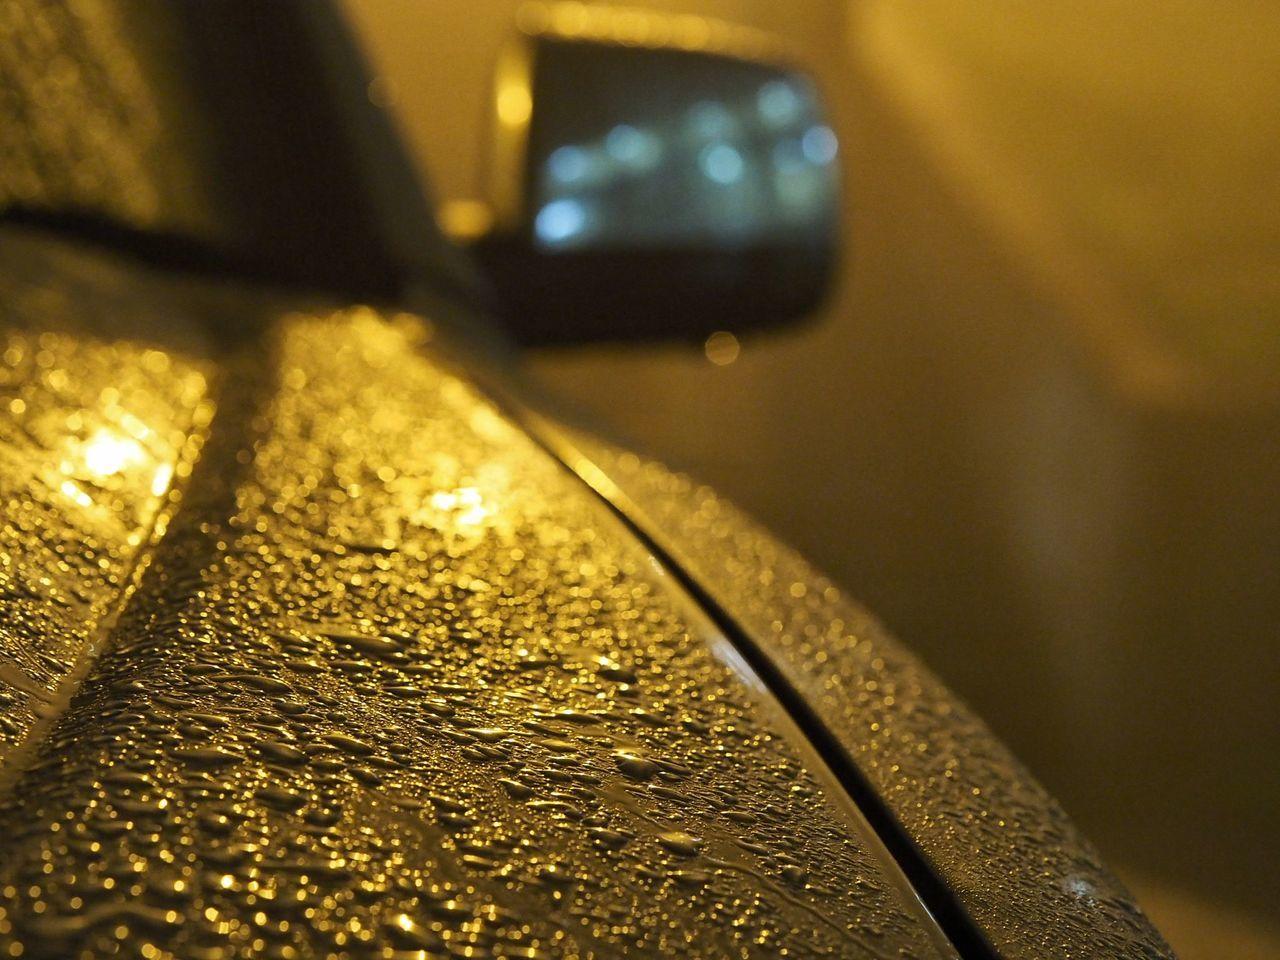 car, close-up, no people, transportation, mode of transport, indoors, drop, land vehicle, night, illuminated, technology